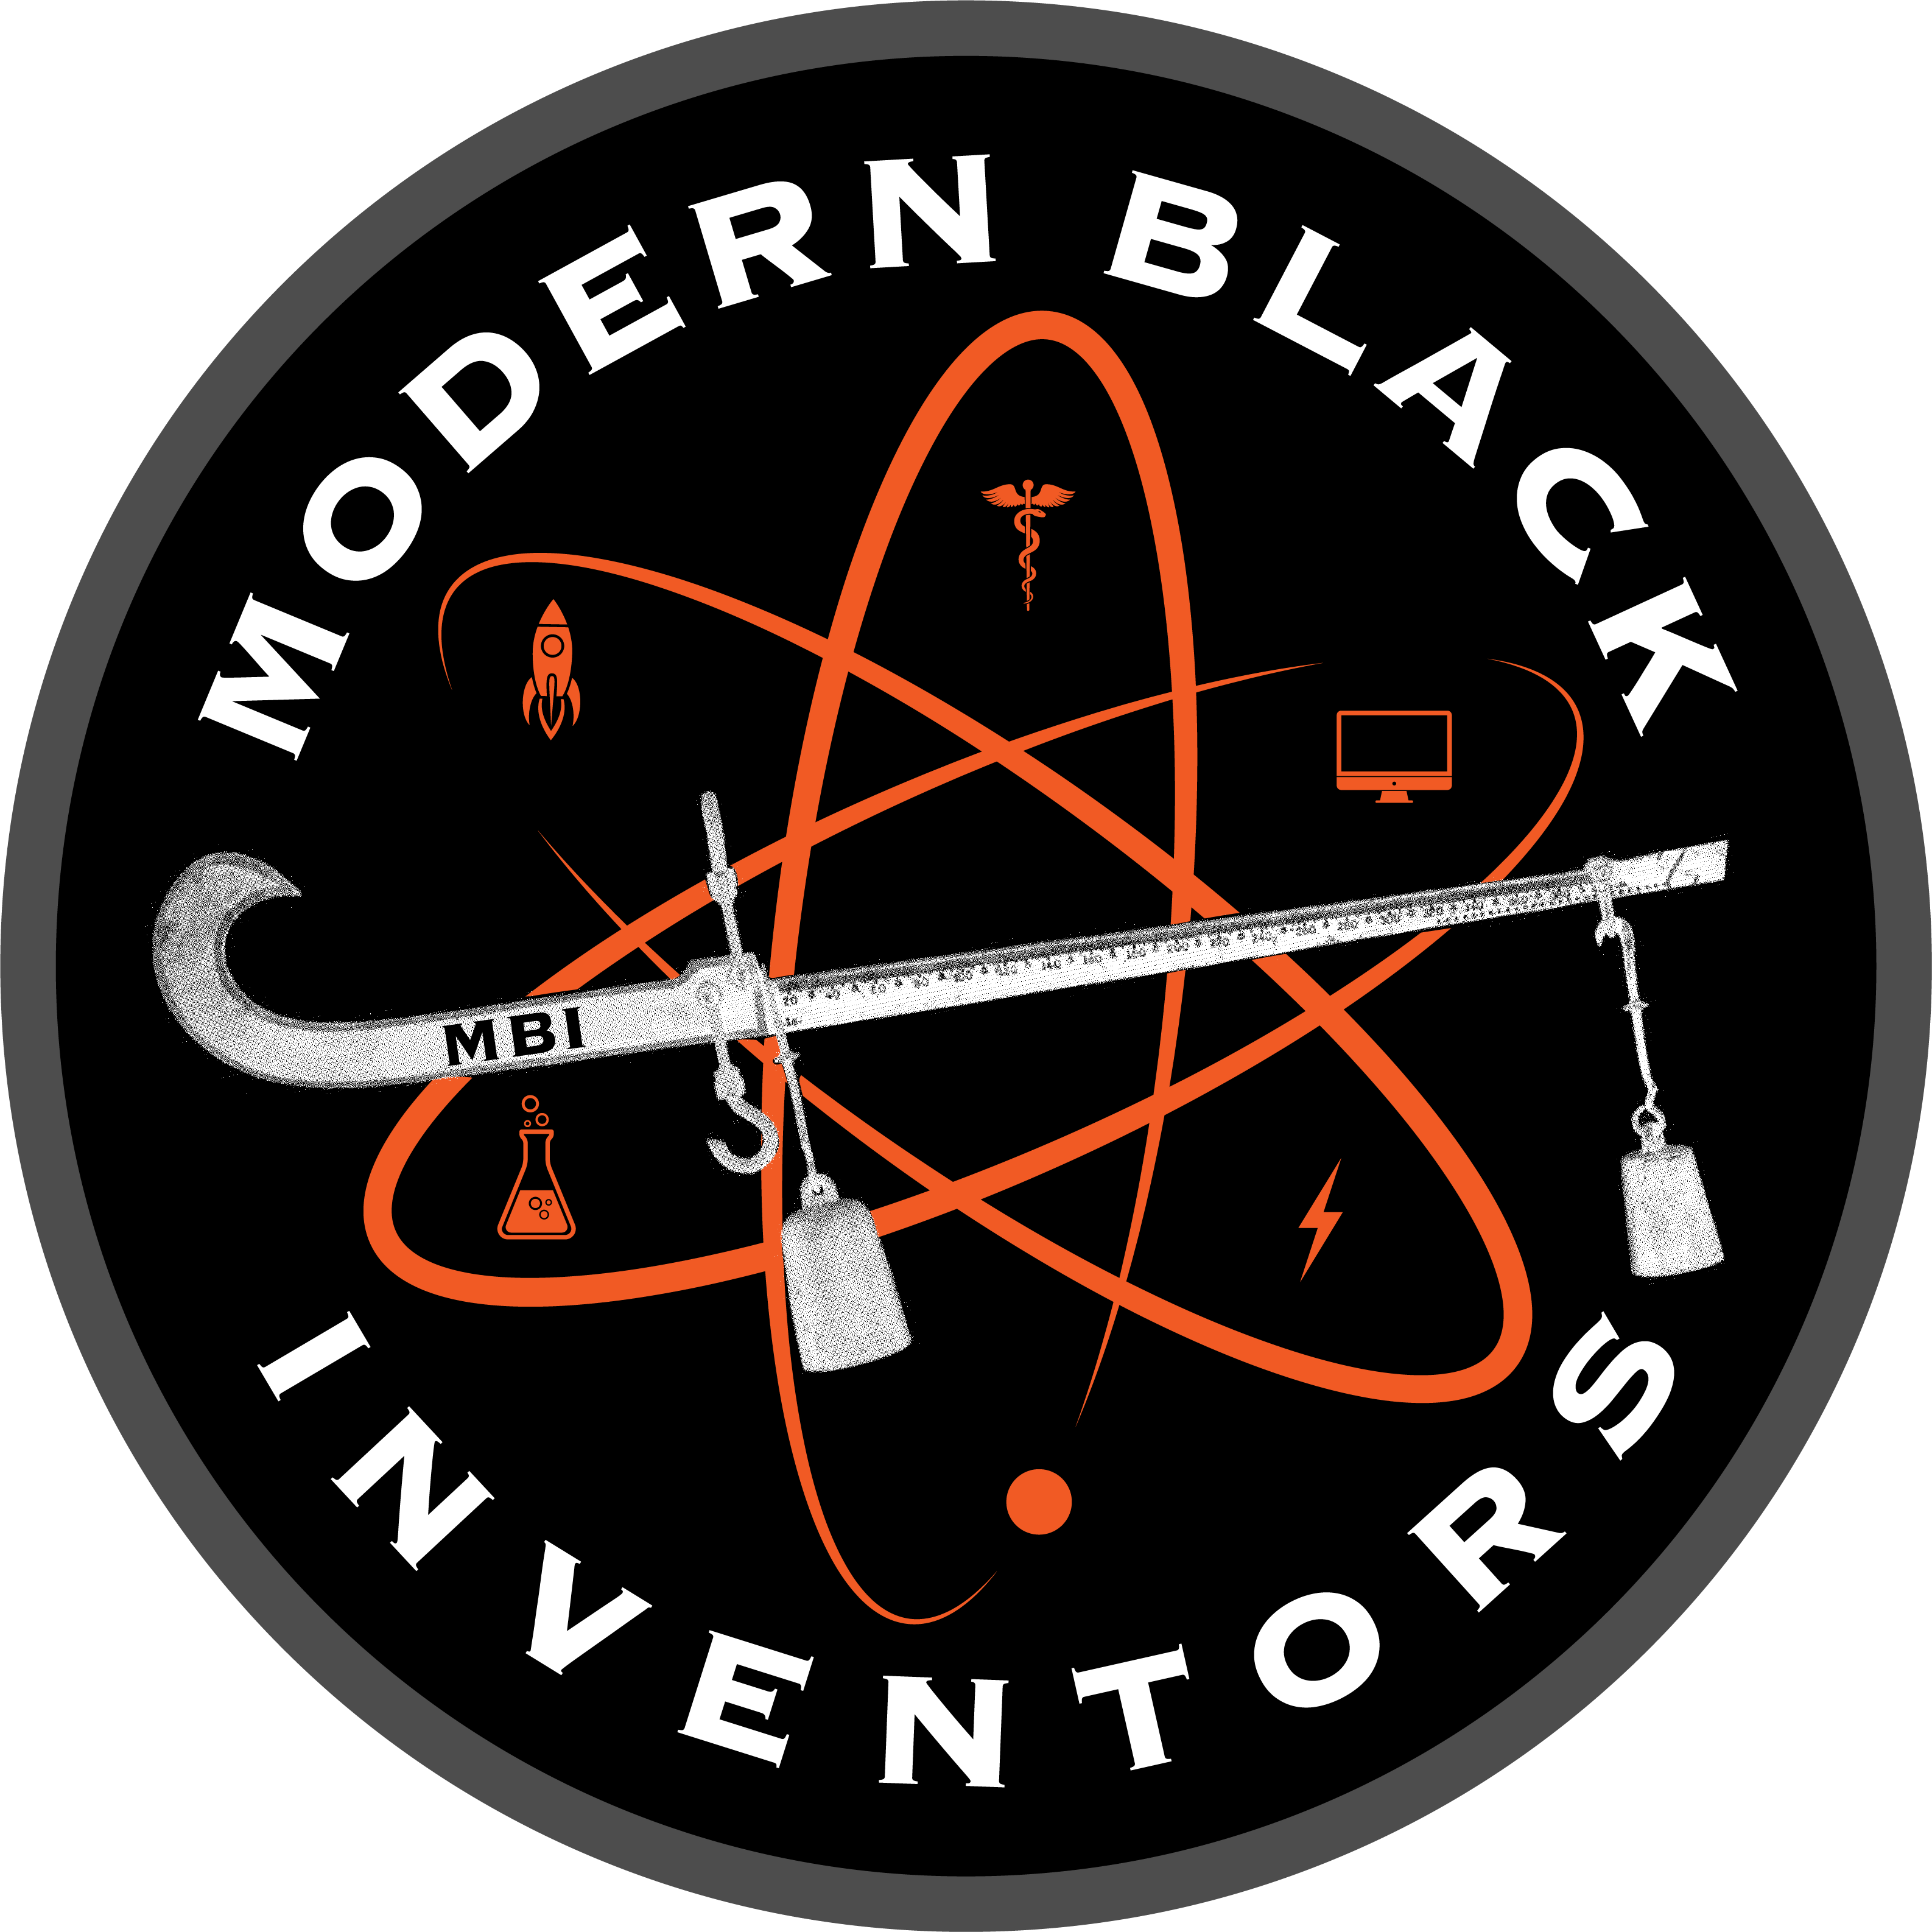 The Black Inventors Bus